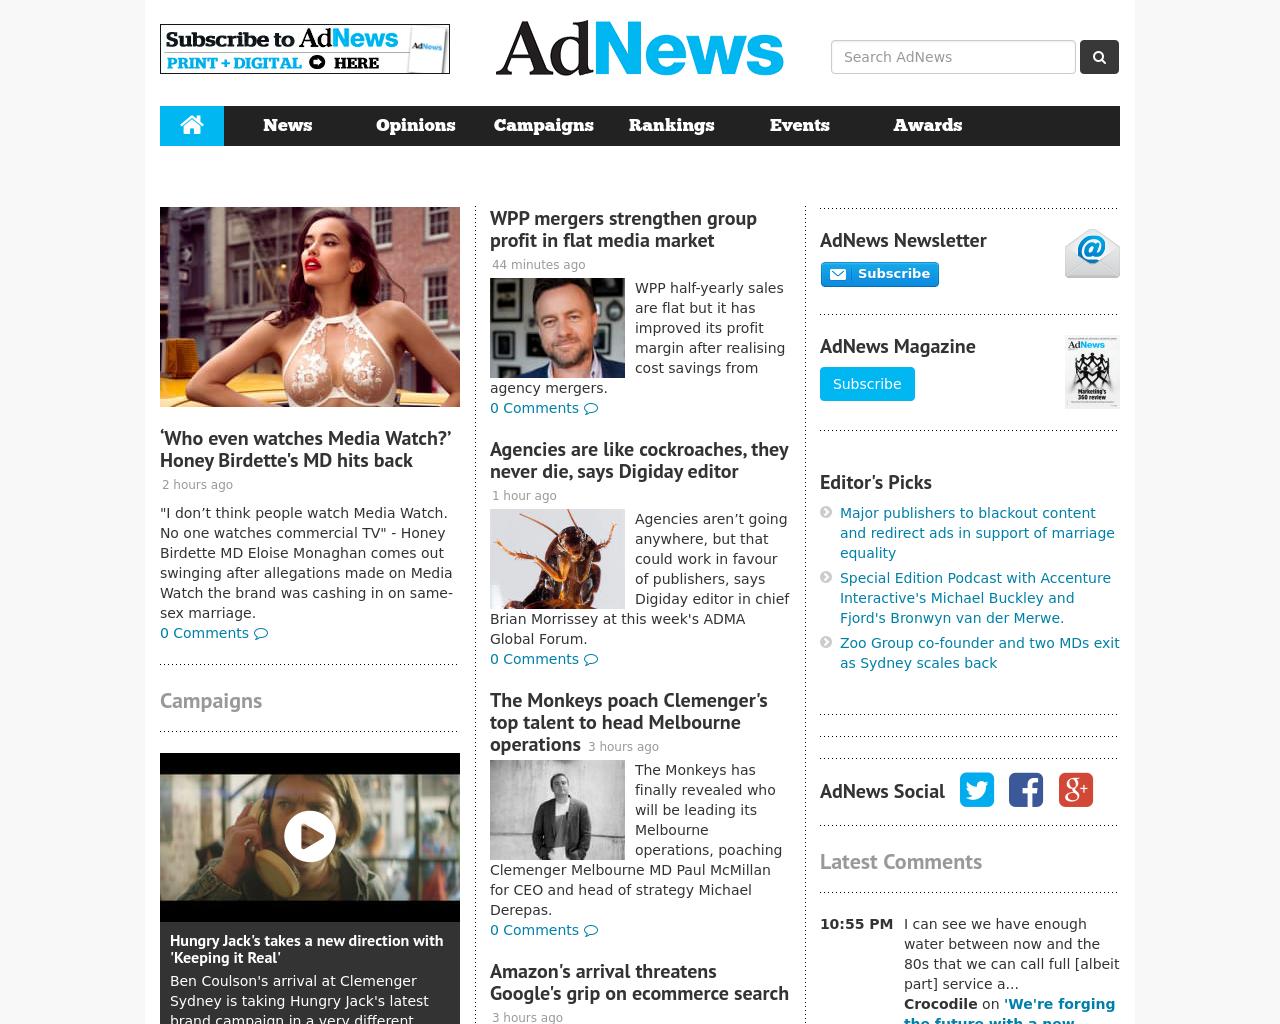 AdNews-Advertising-Reviews-Pricing